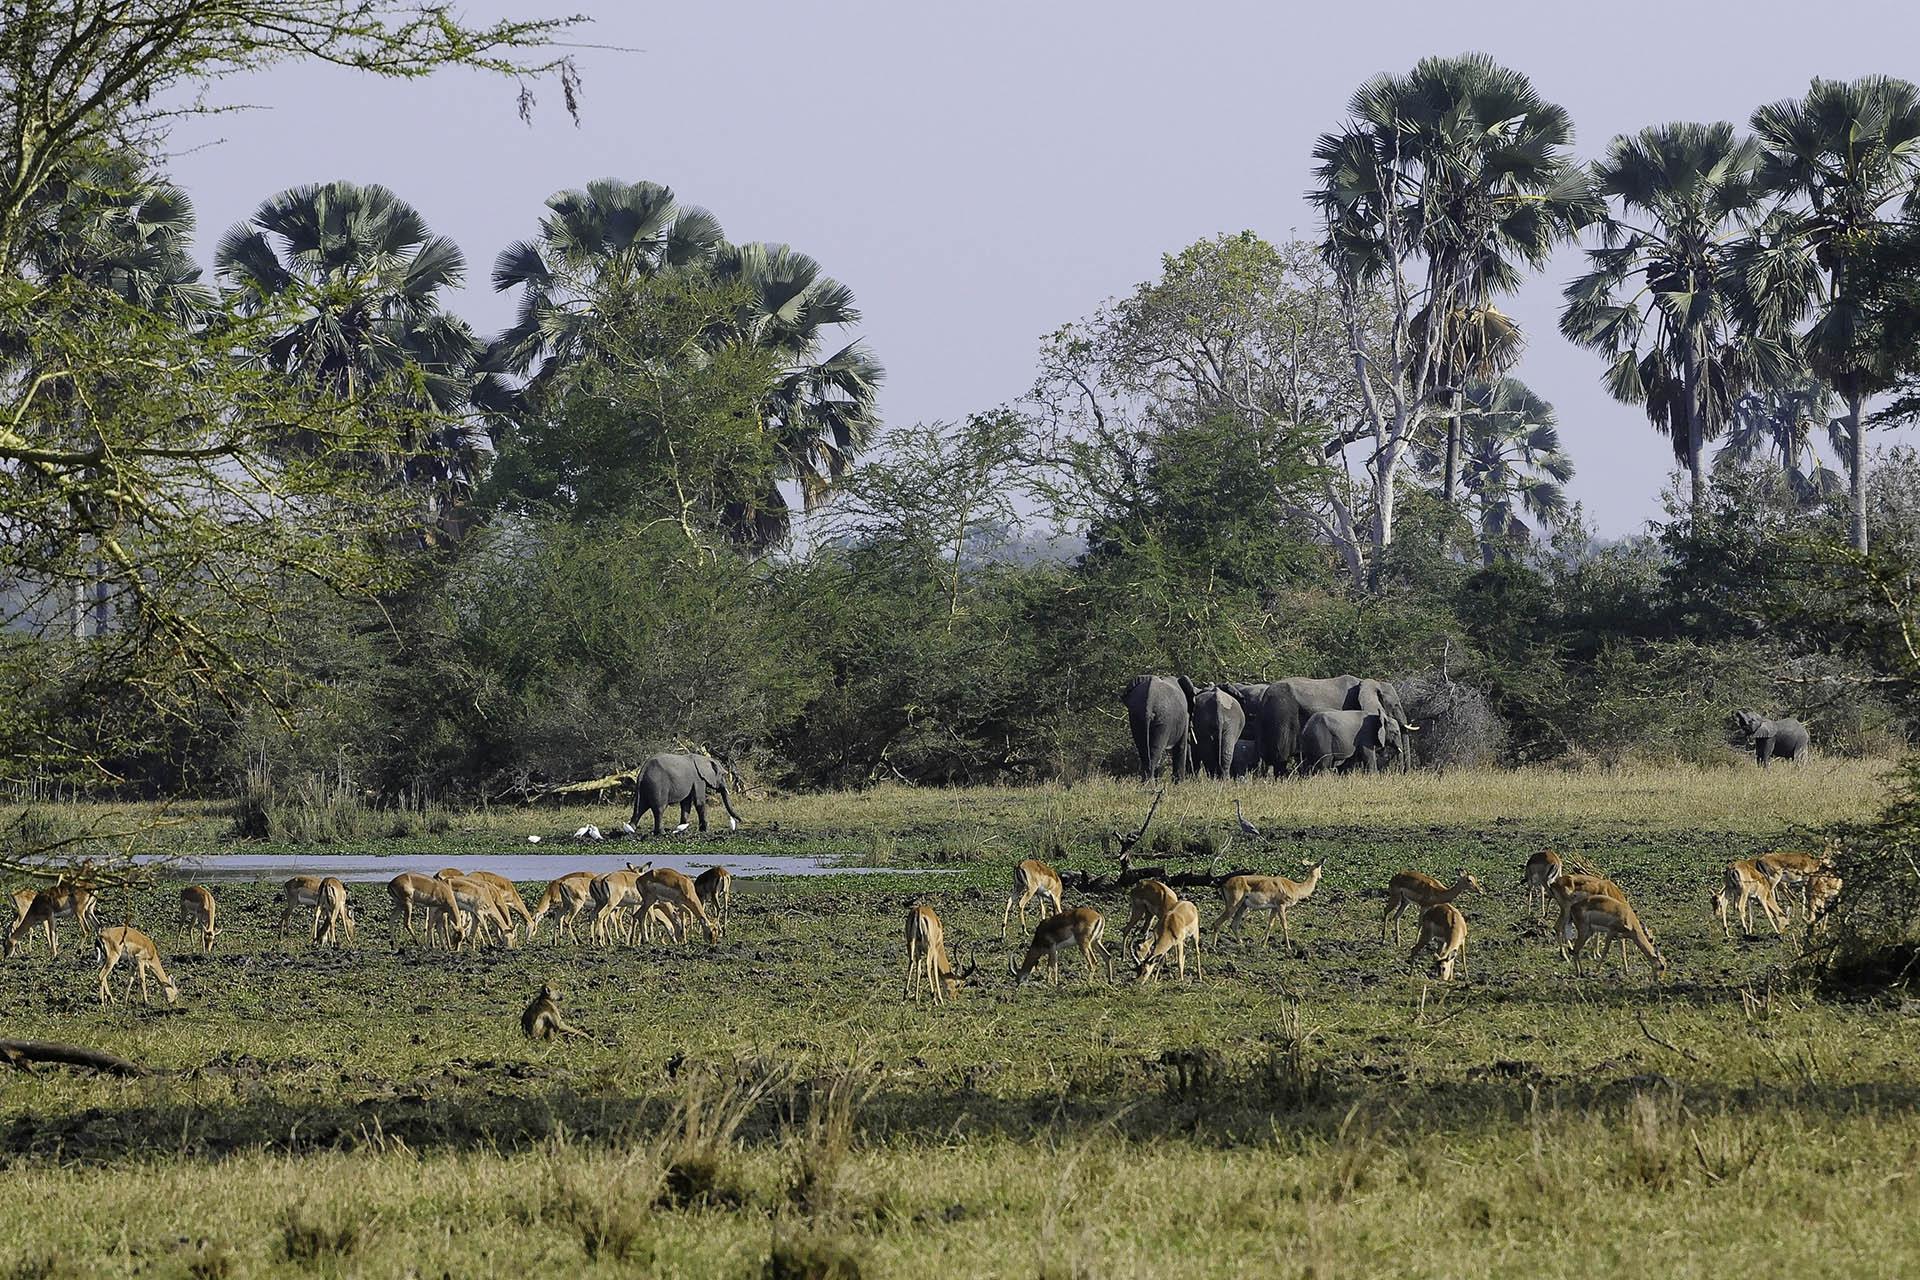 mount mulanje tours-malawian-style-malawi-adventures-experiences-specialist-tour-operator-mvuu-landscape-elephants